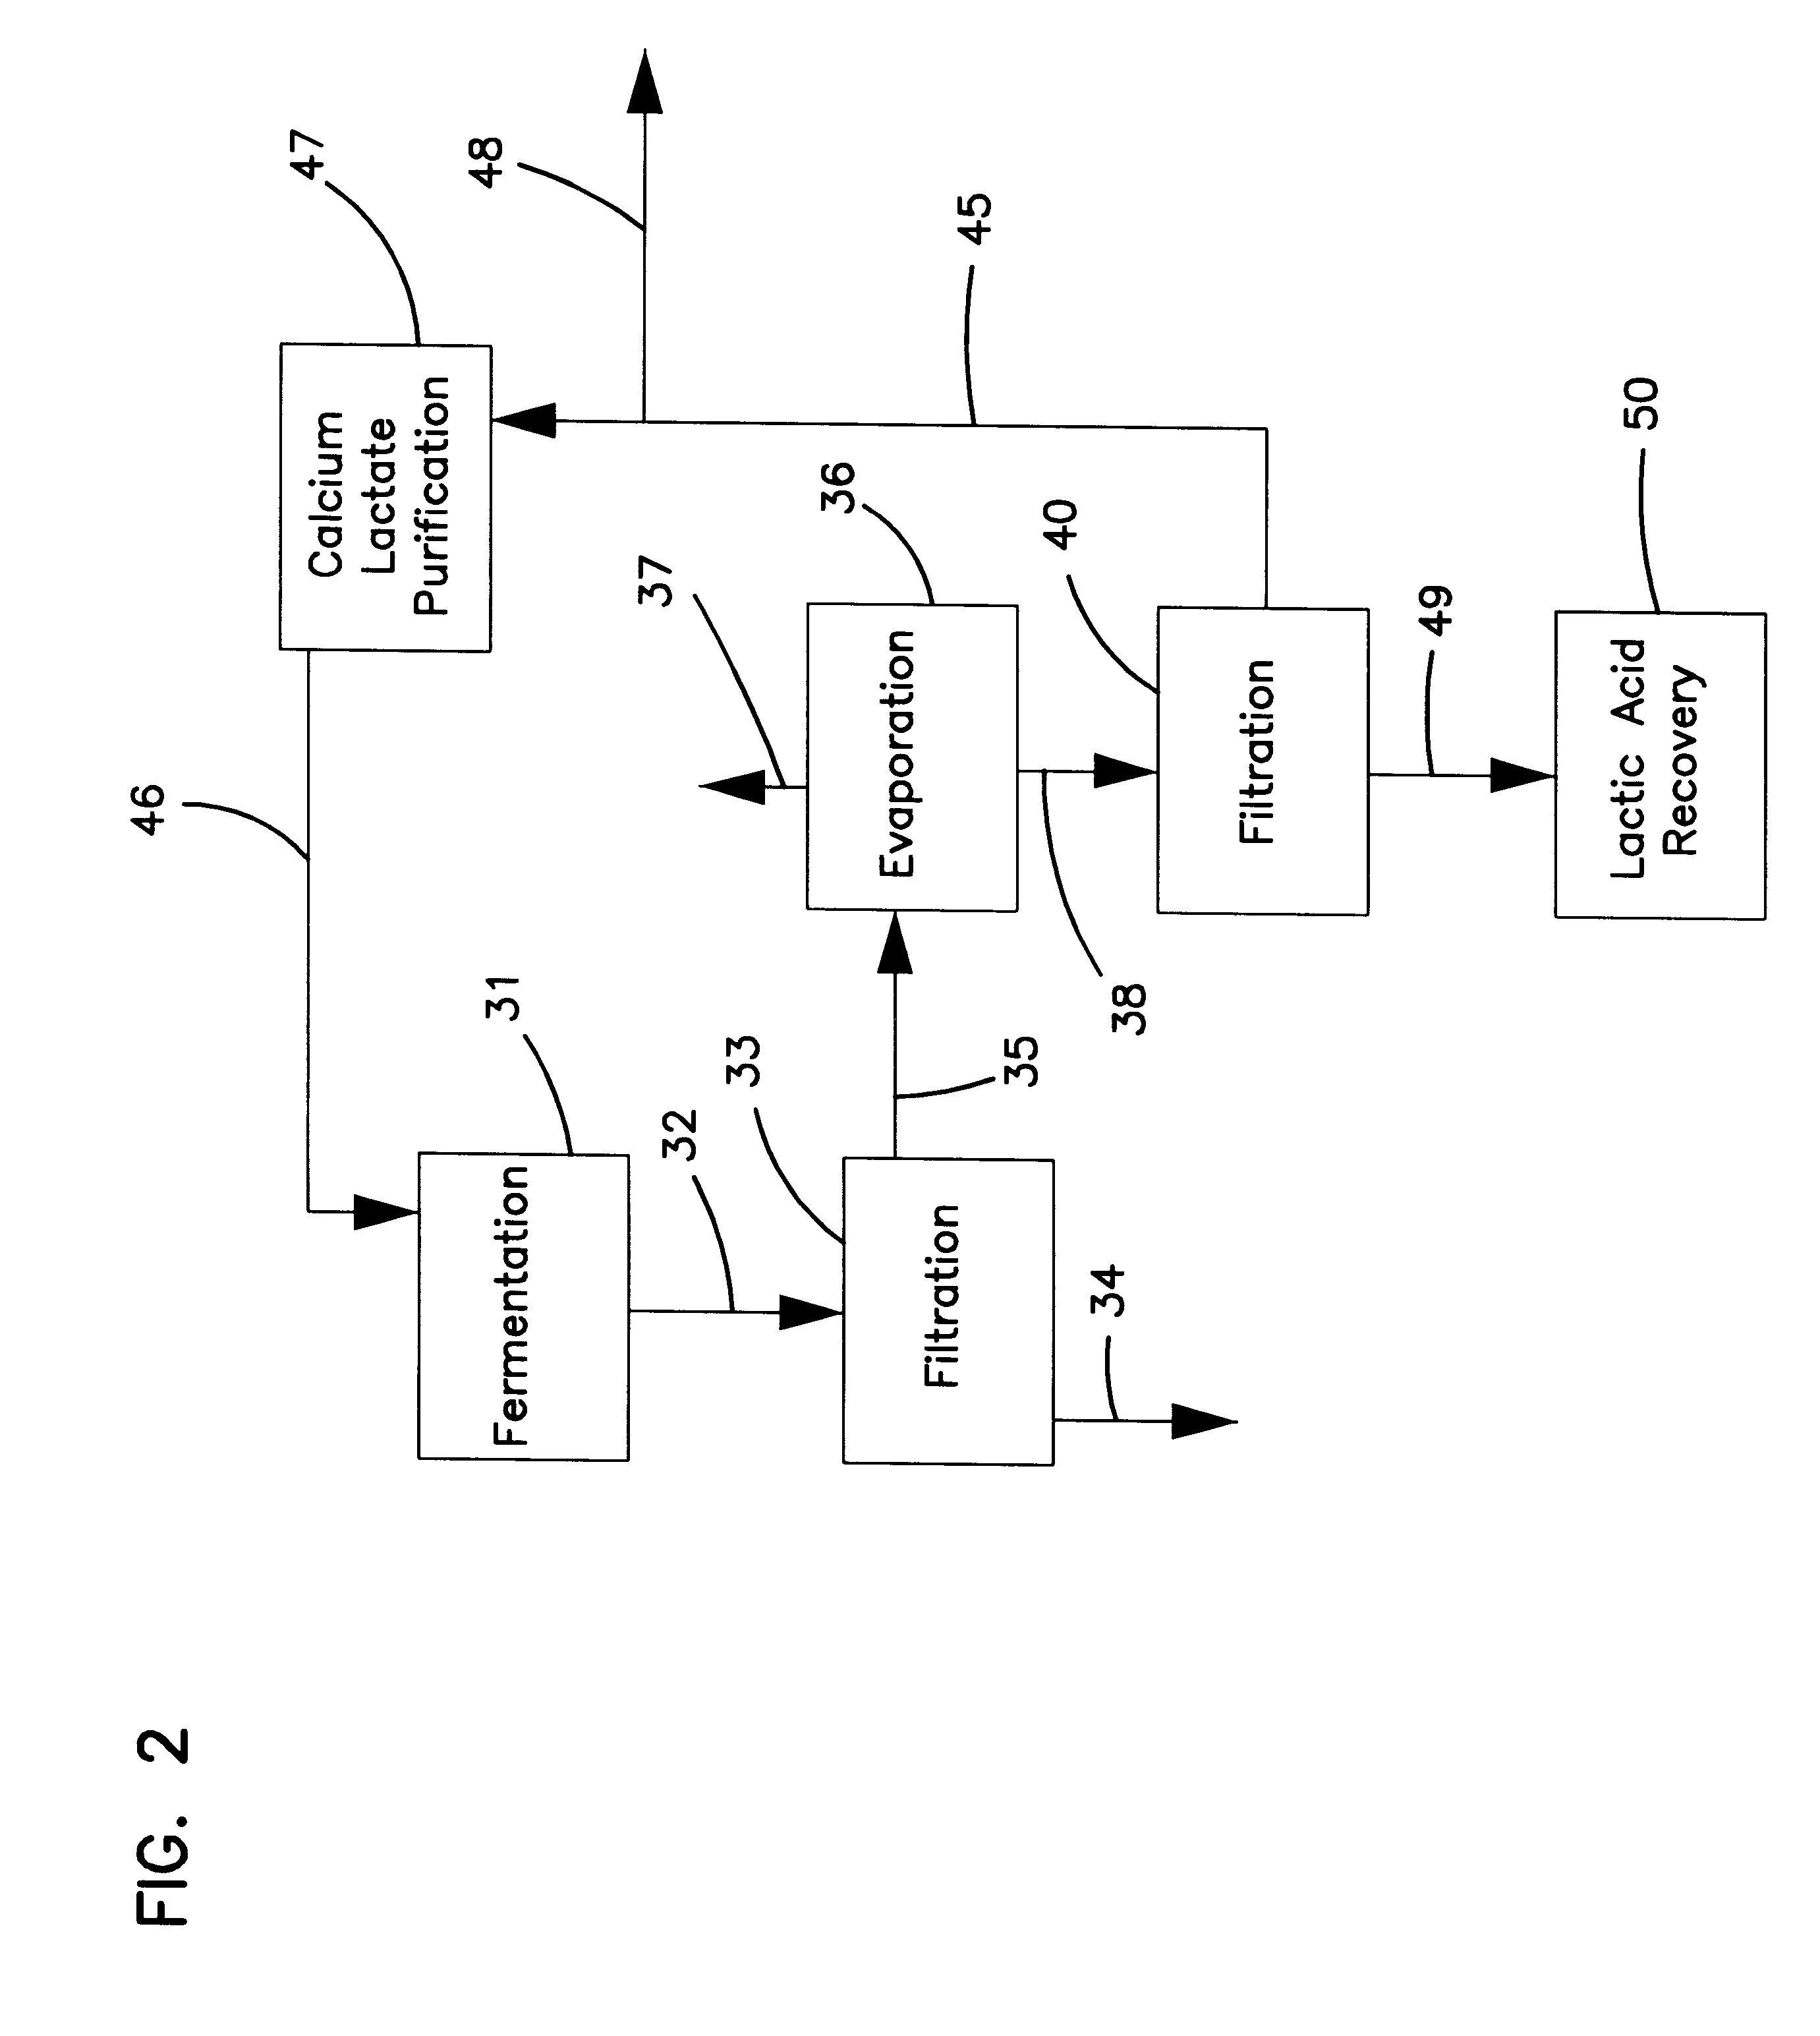 patent us6229046 lactic acid processing methods arrangements and products patents